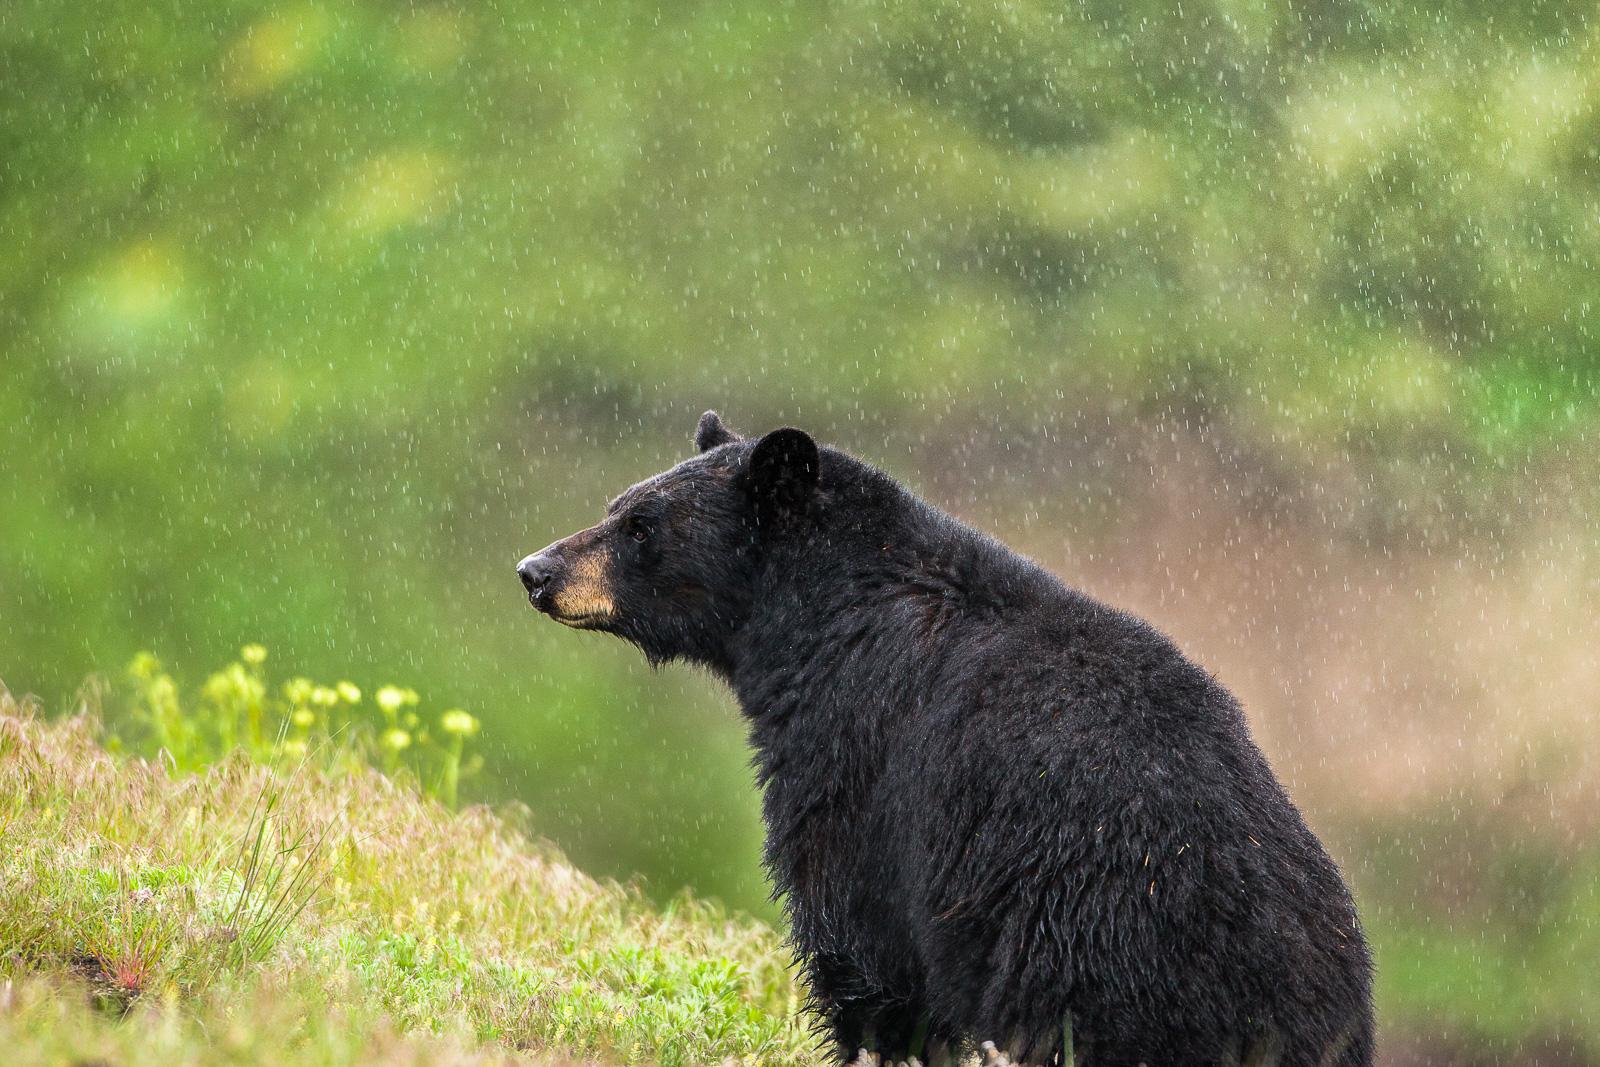 Bearly Raining,Yellowstone, National Park, Wyoming,black,bear,water,spring,green, photo